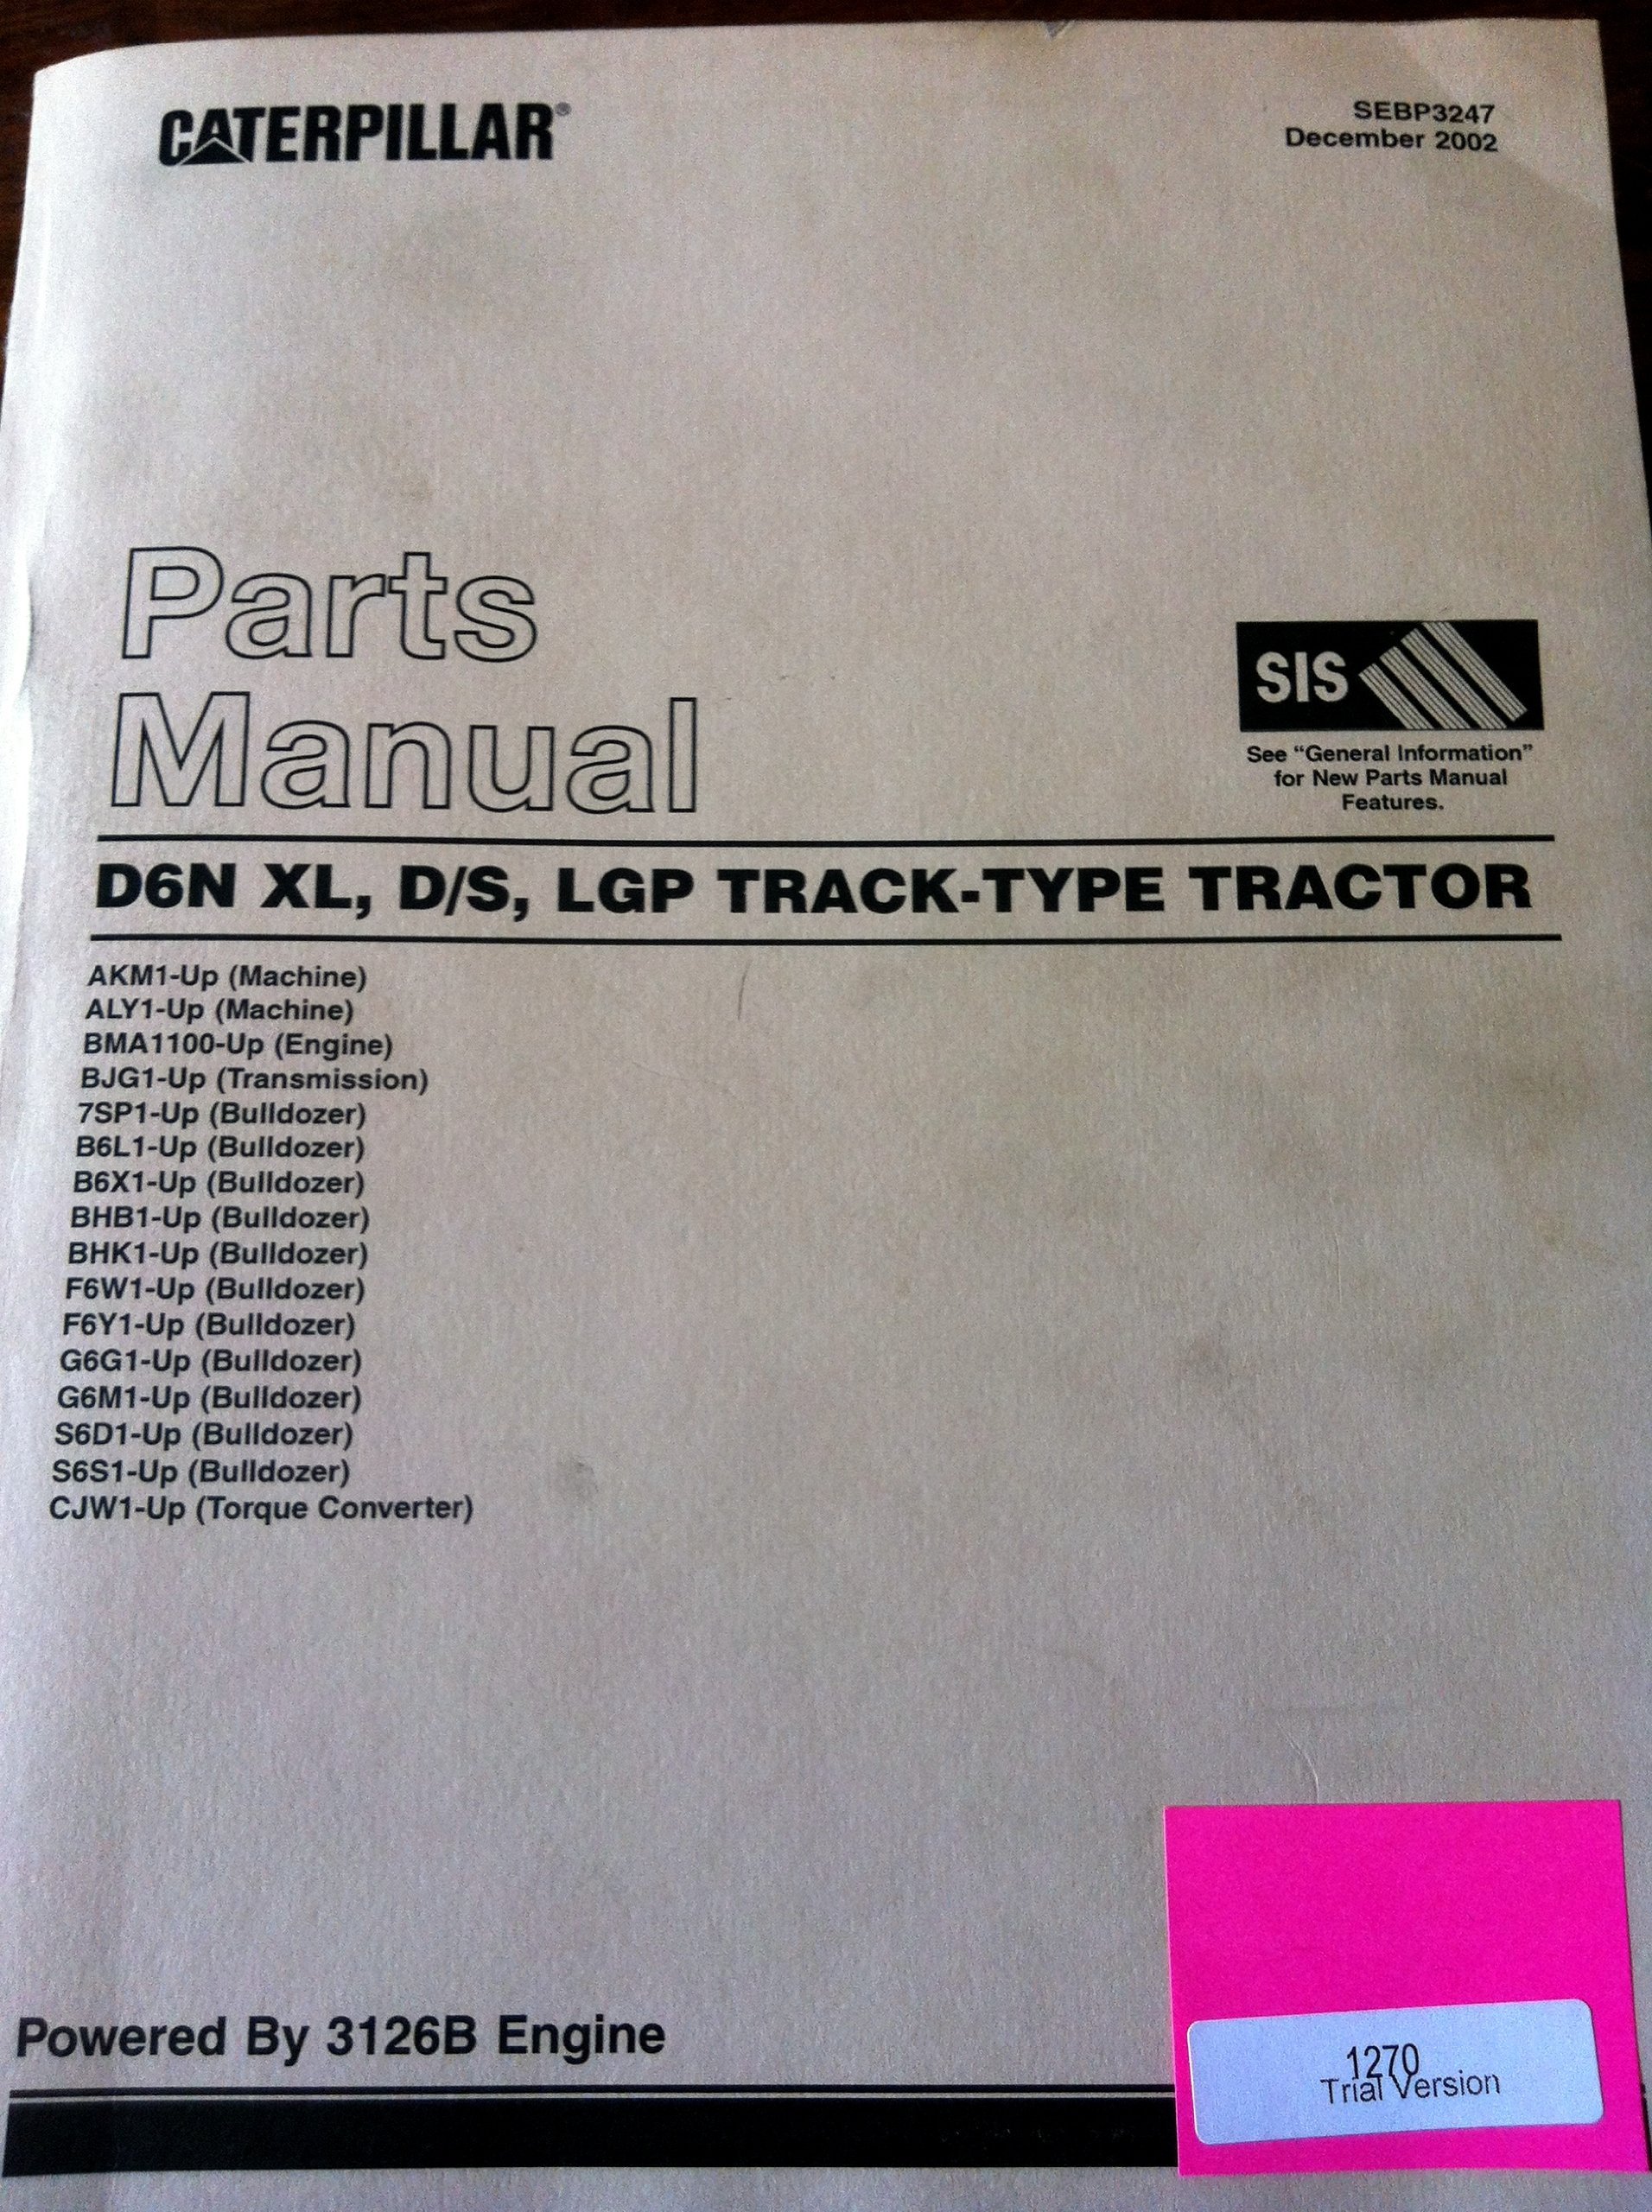 Cat Caterpillar D6N XL DS LGP Track Type Tractor Parts